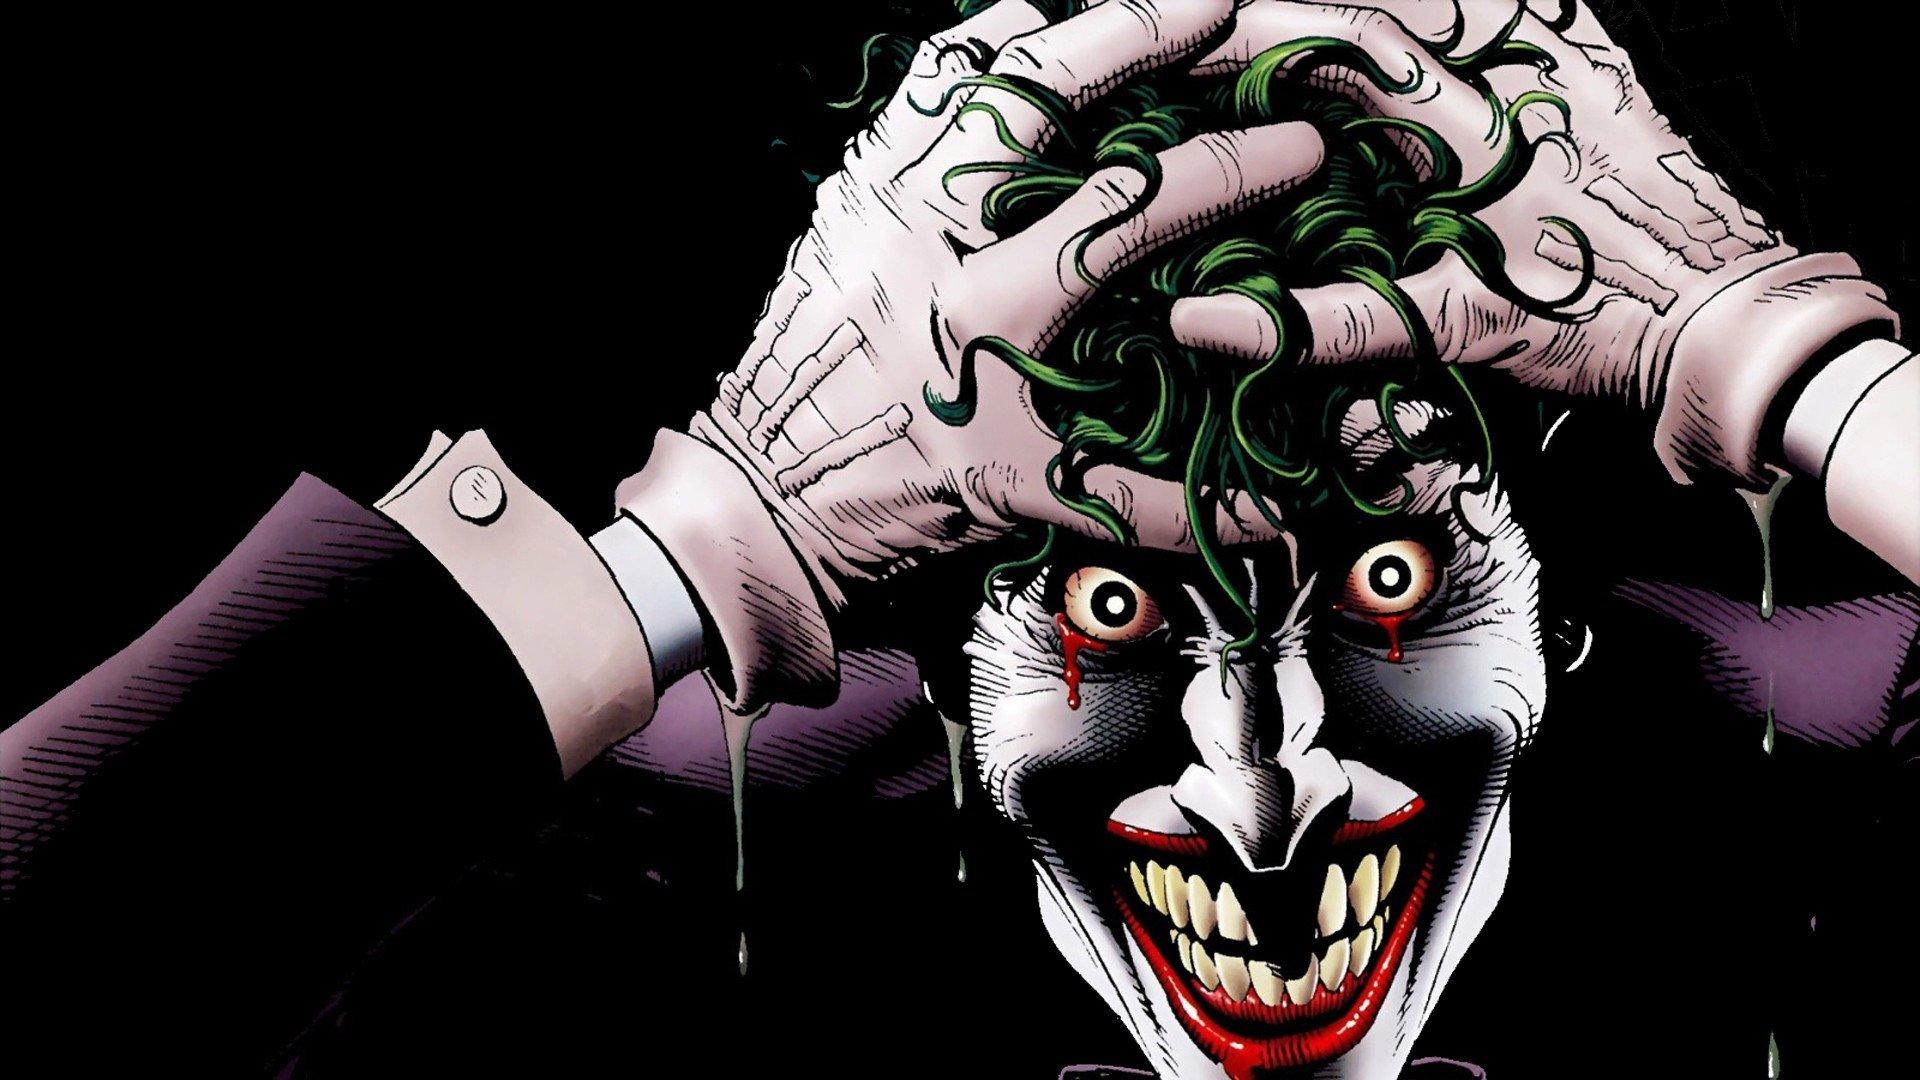 Joker Wallpapers 1920x1080 Full Hd 1080p Desktop Backgrounds